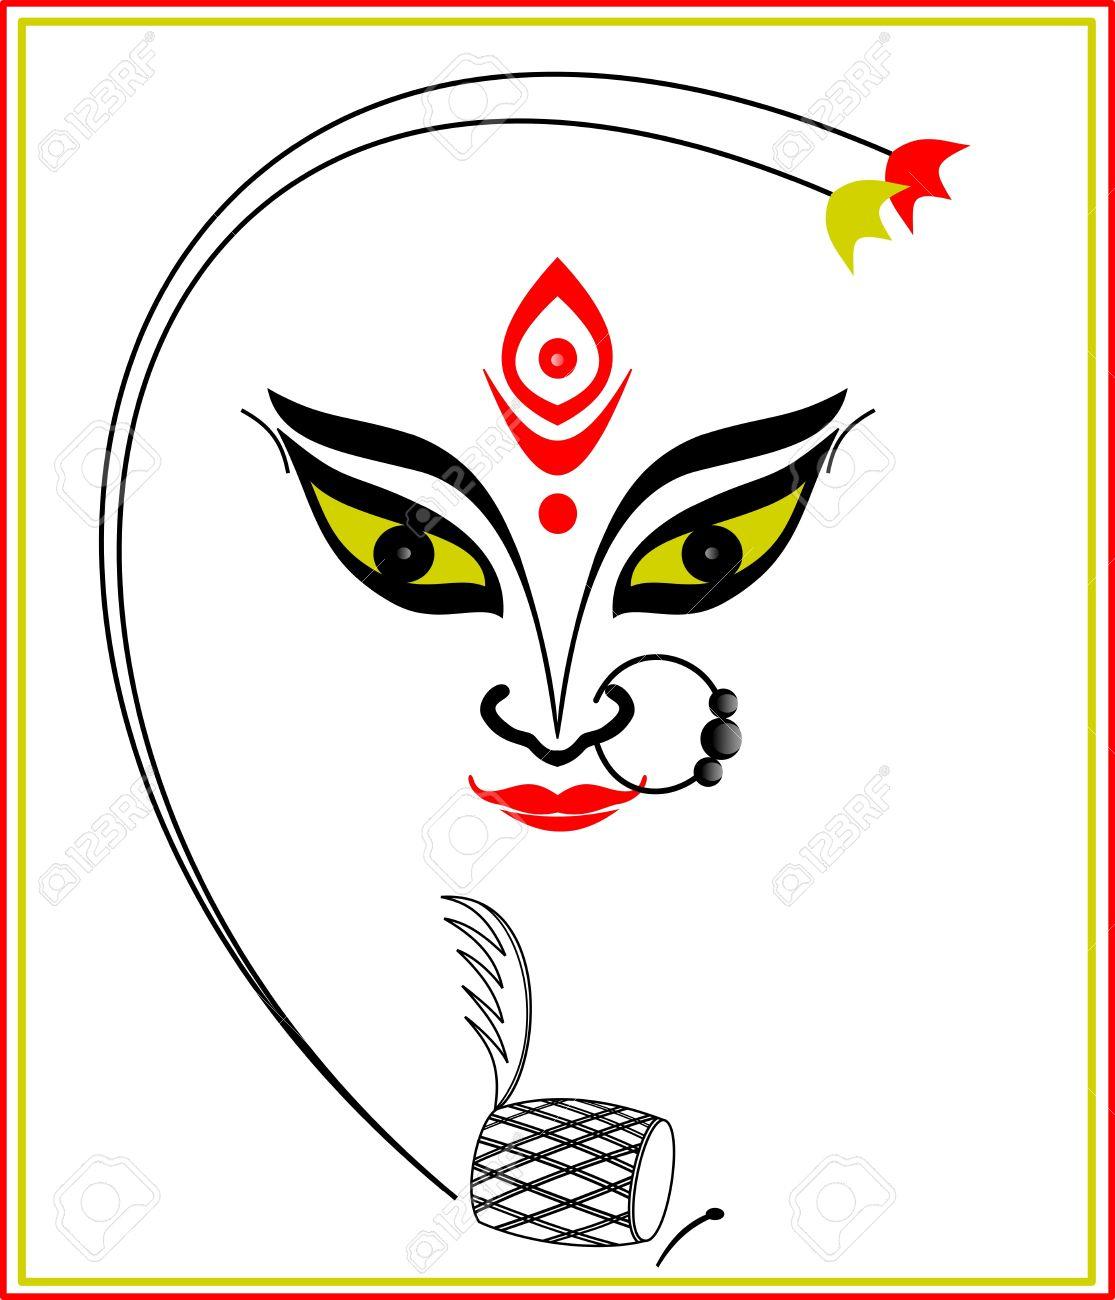 Durga Maa Face Sketches Hindu Clipart Goddess Durga u2013 Pencil And In Color  Hindu Clipart